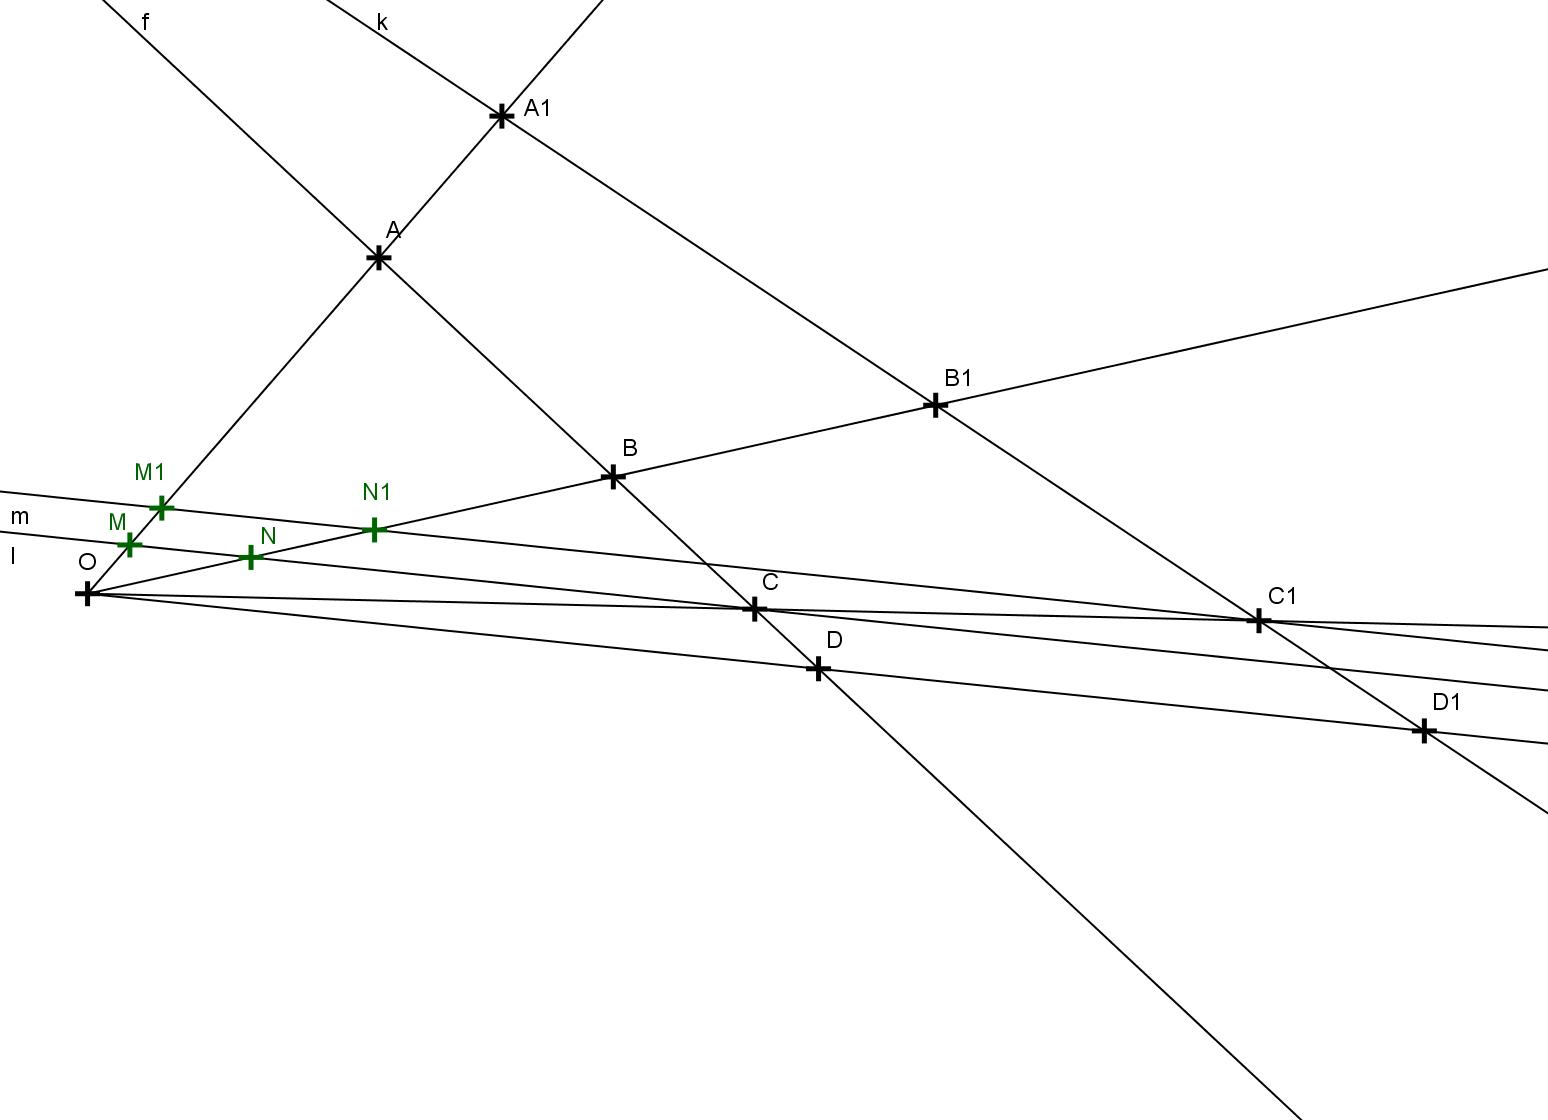 http://forum.matematika.cz/upload3/img/2017-05/62066_podobnost%2Bp%25C5%2599esD.png